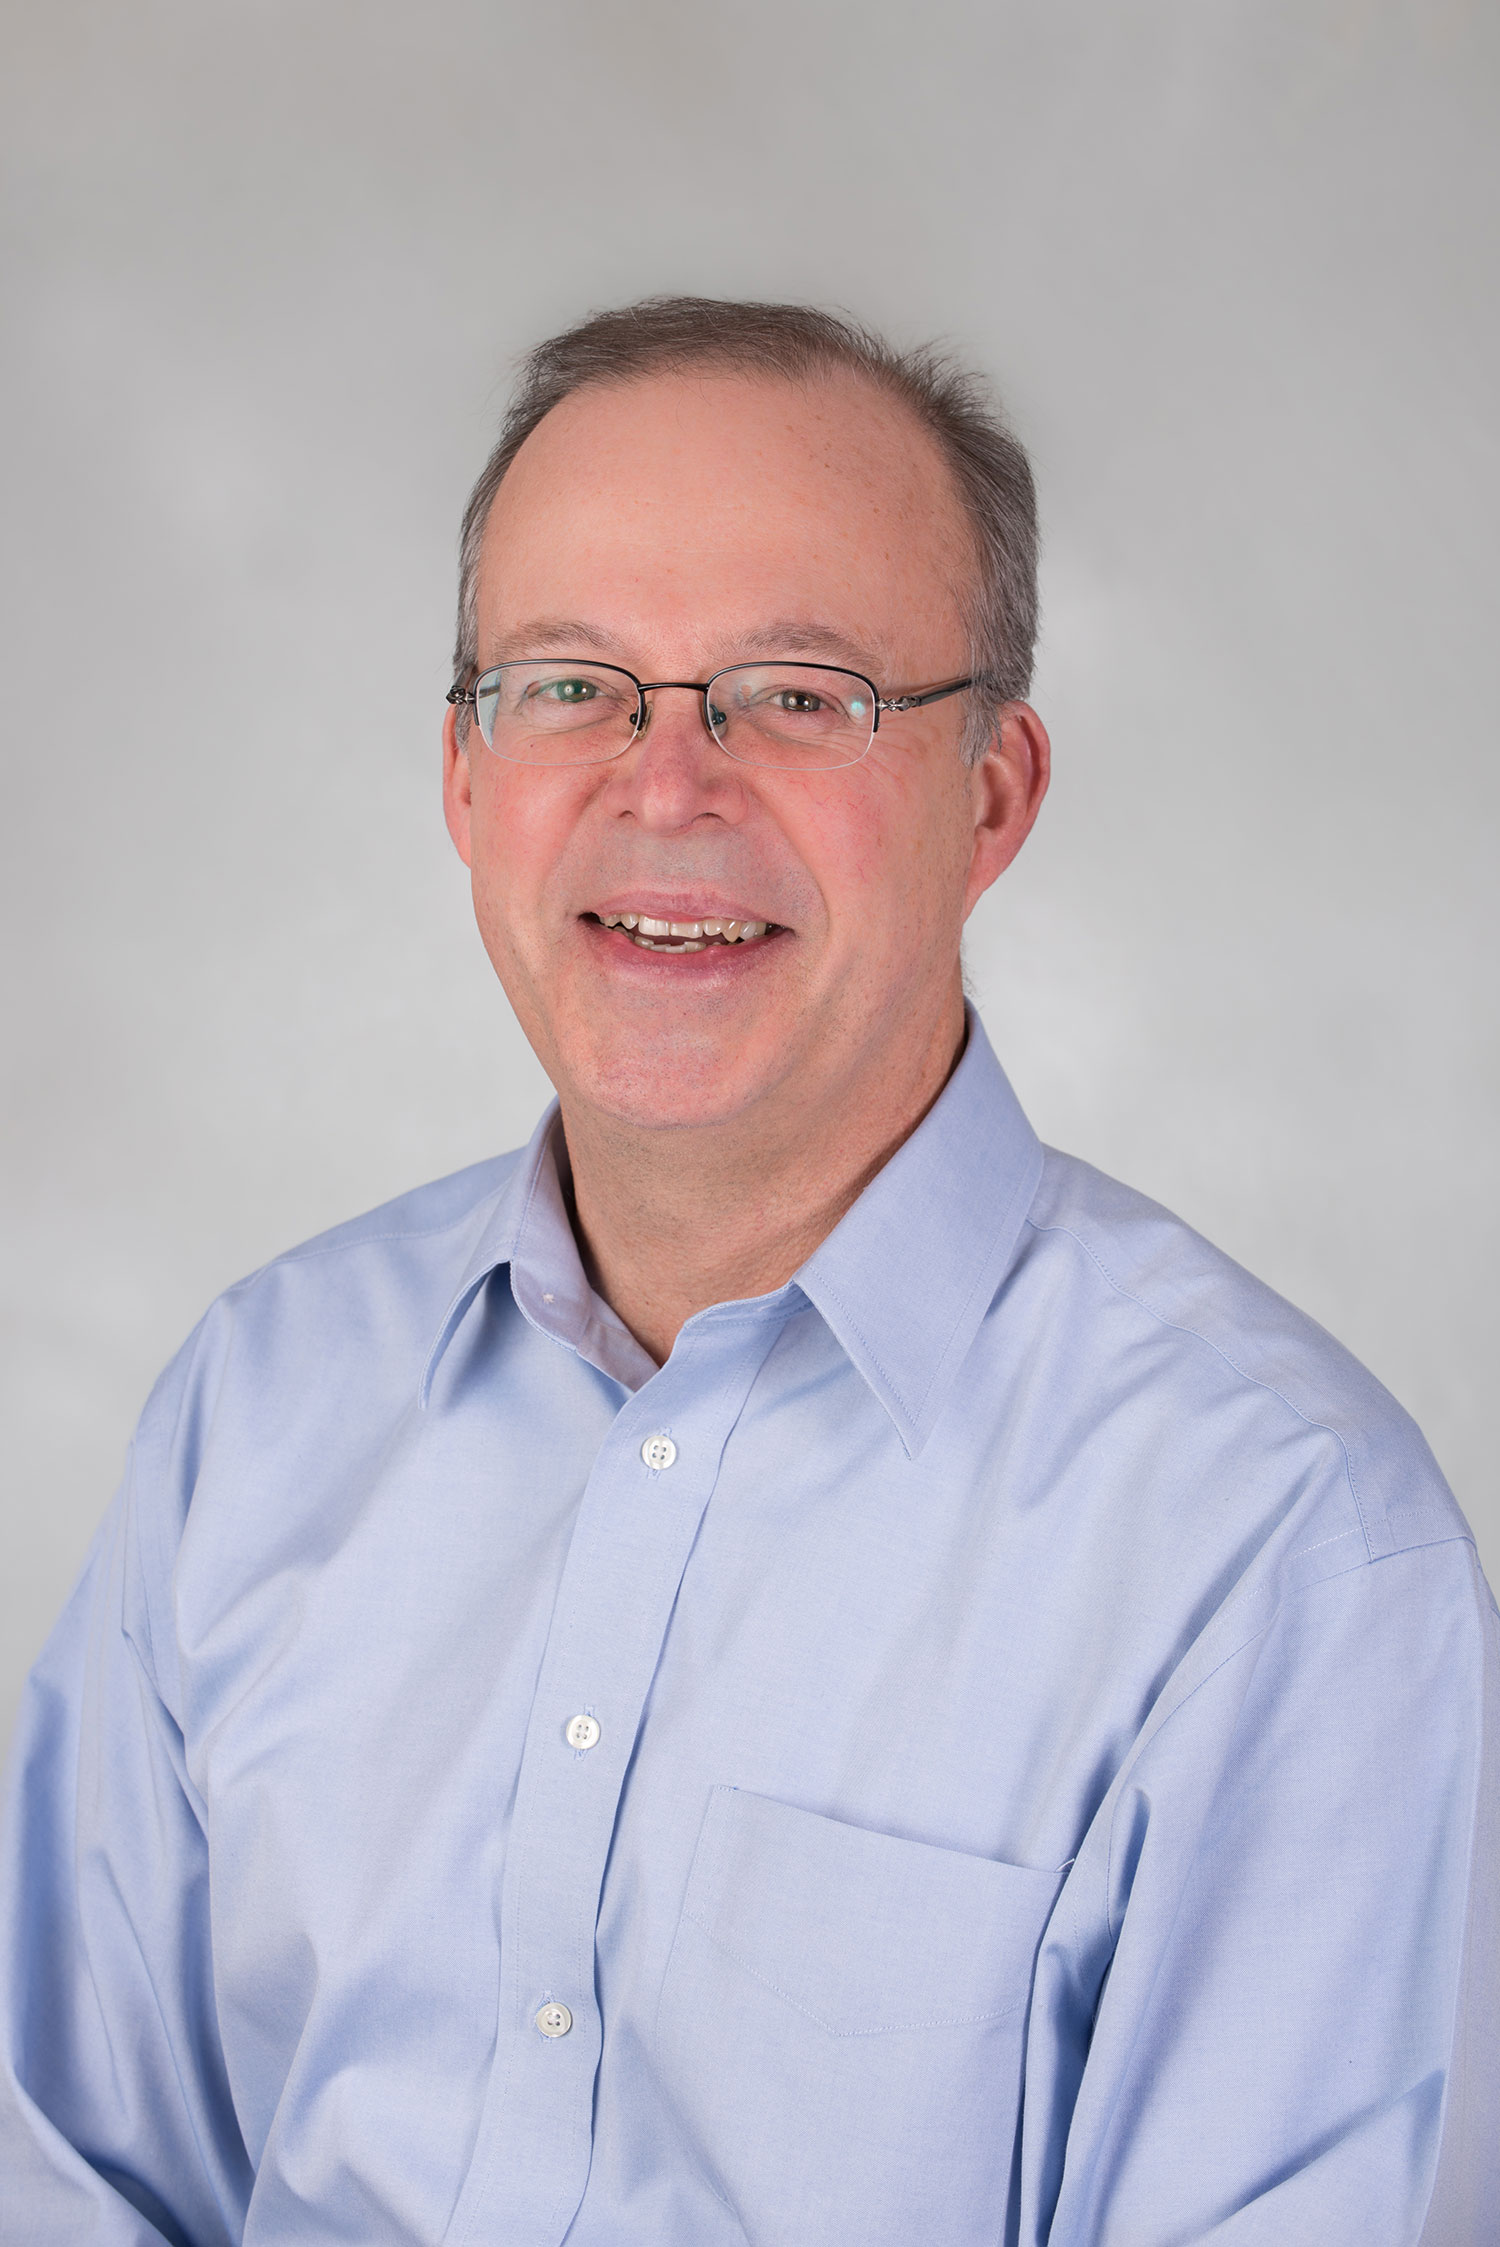 Gary Dixon, Director